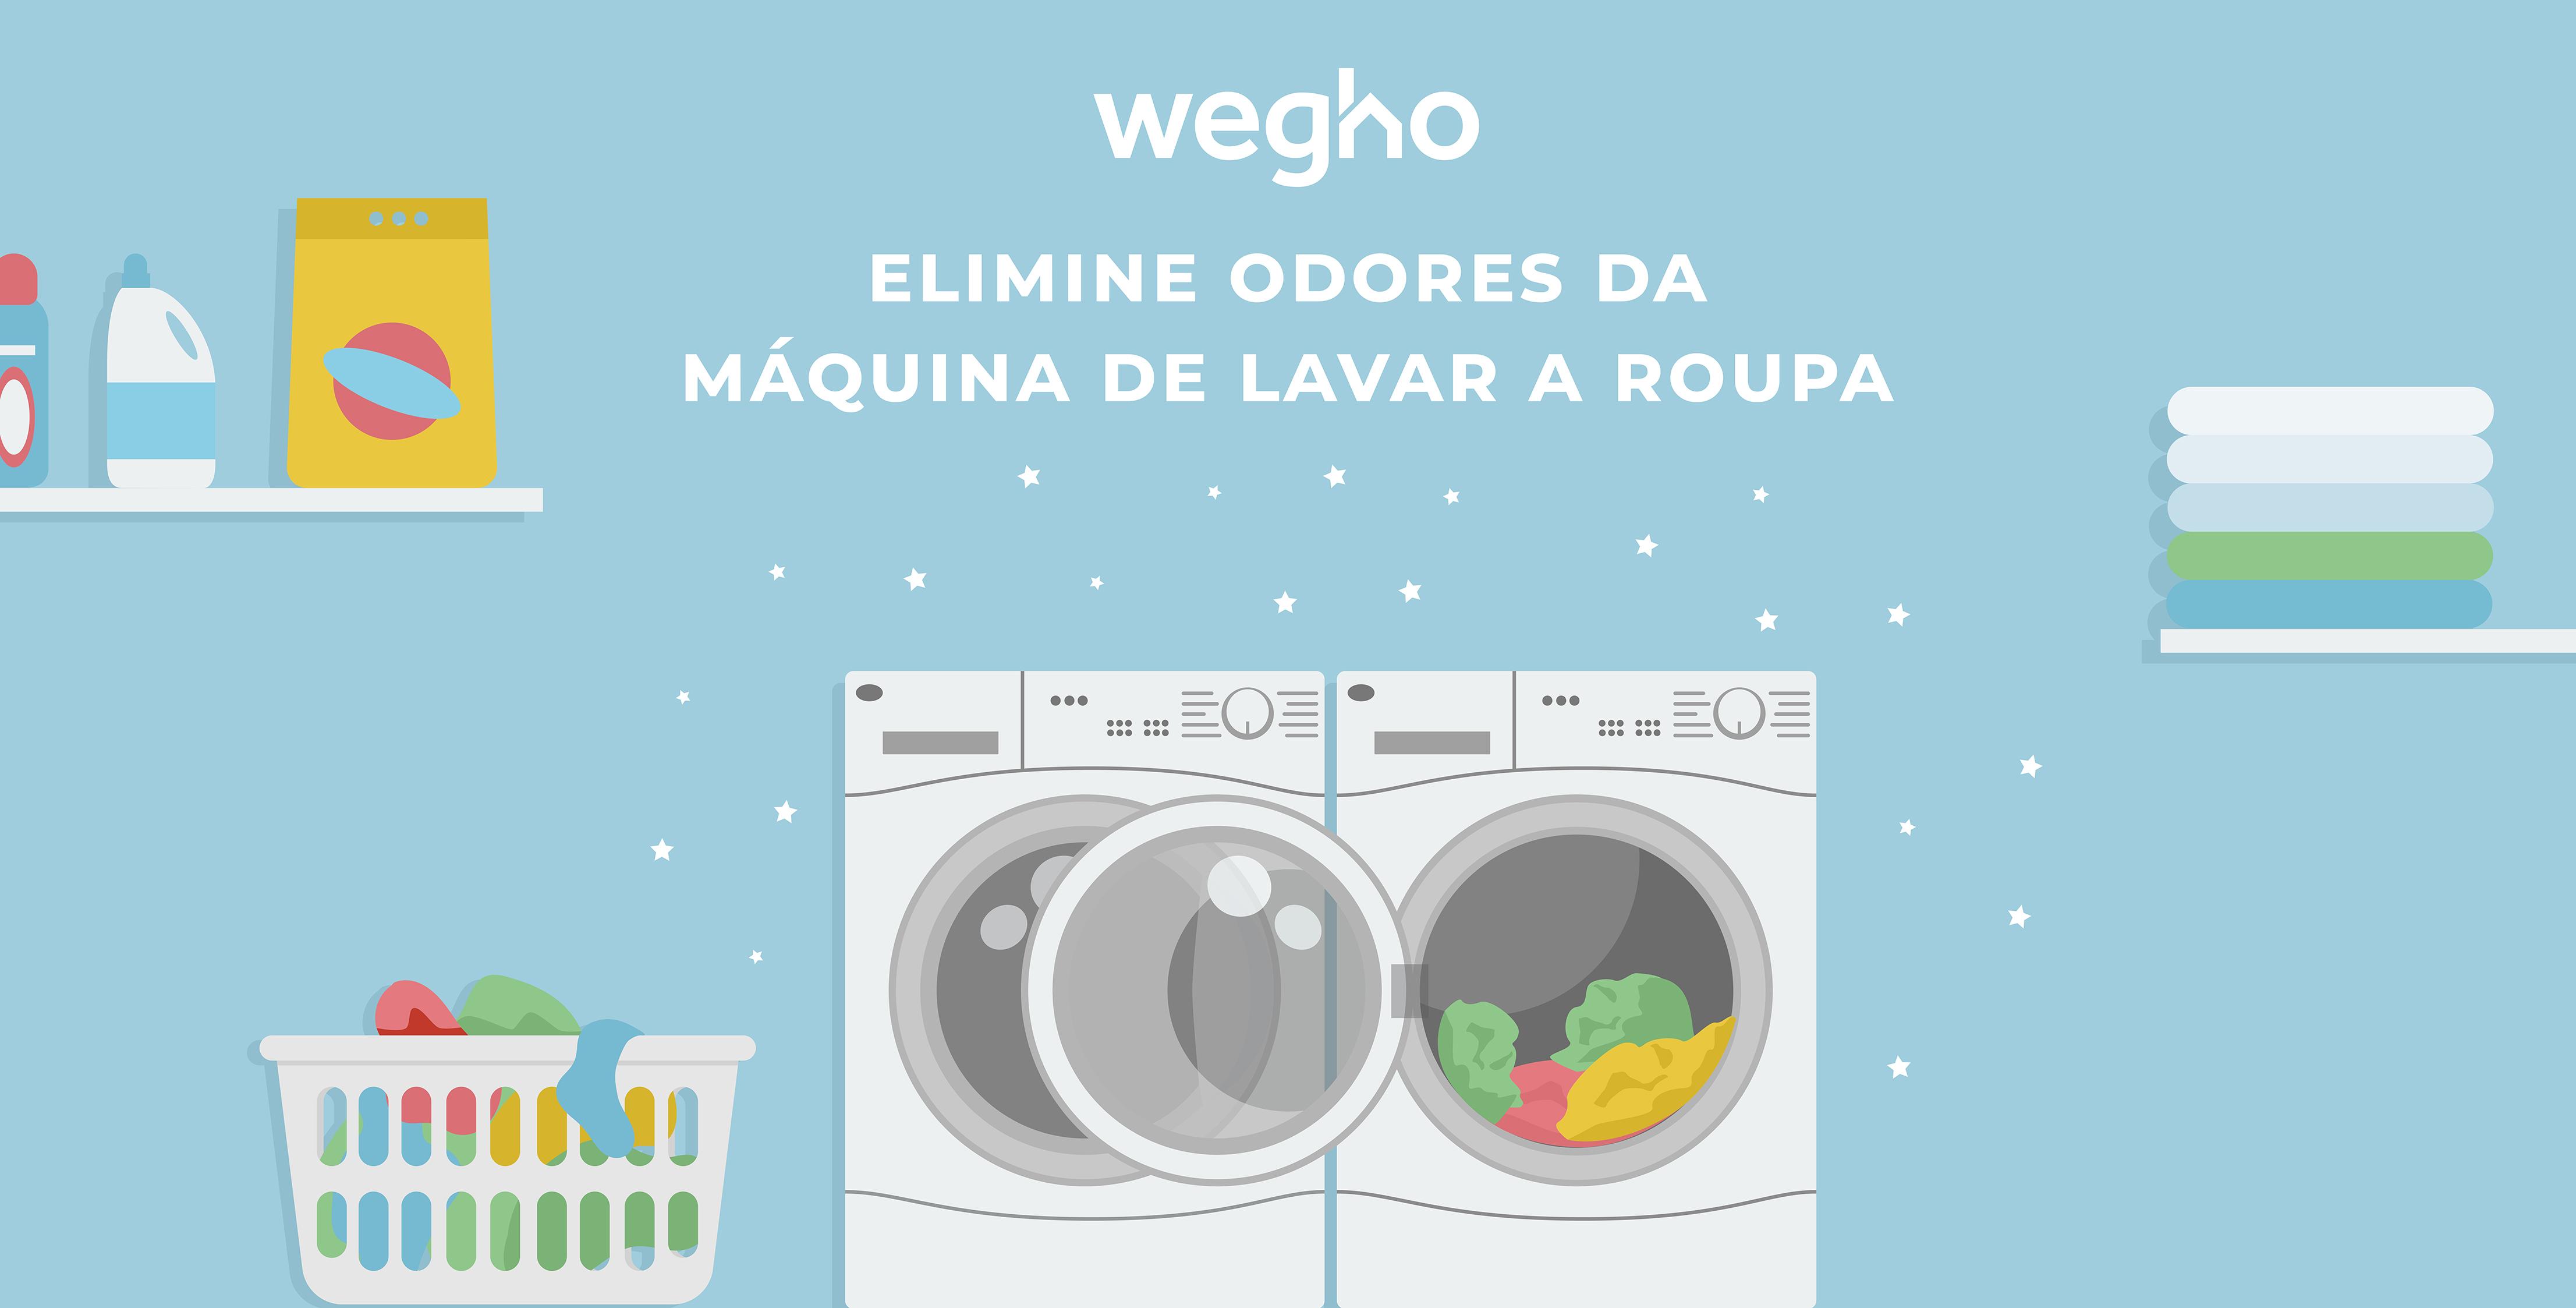 Elimine odores da máquina de lavar roupa